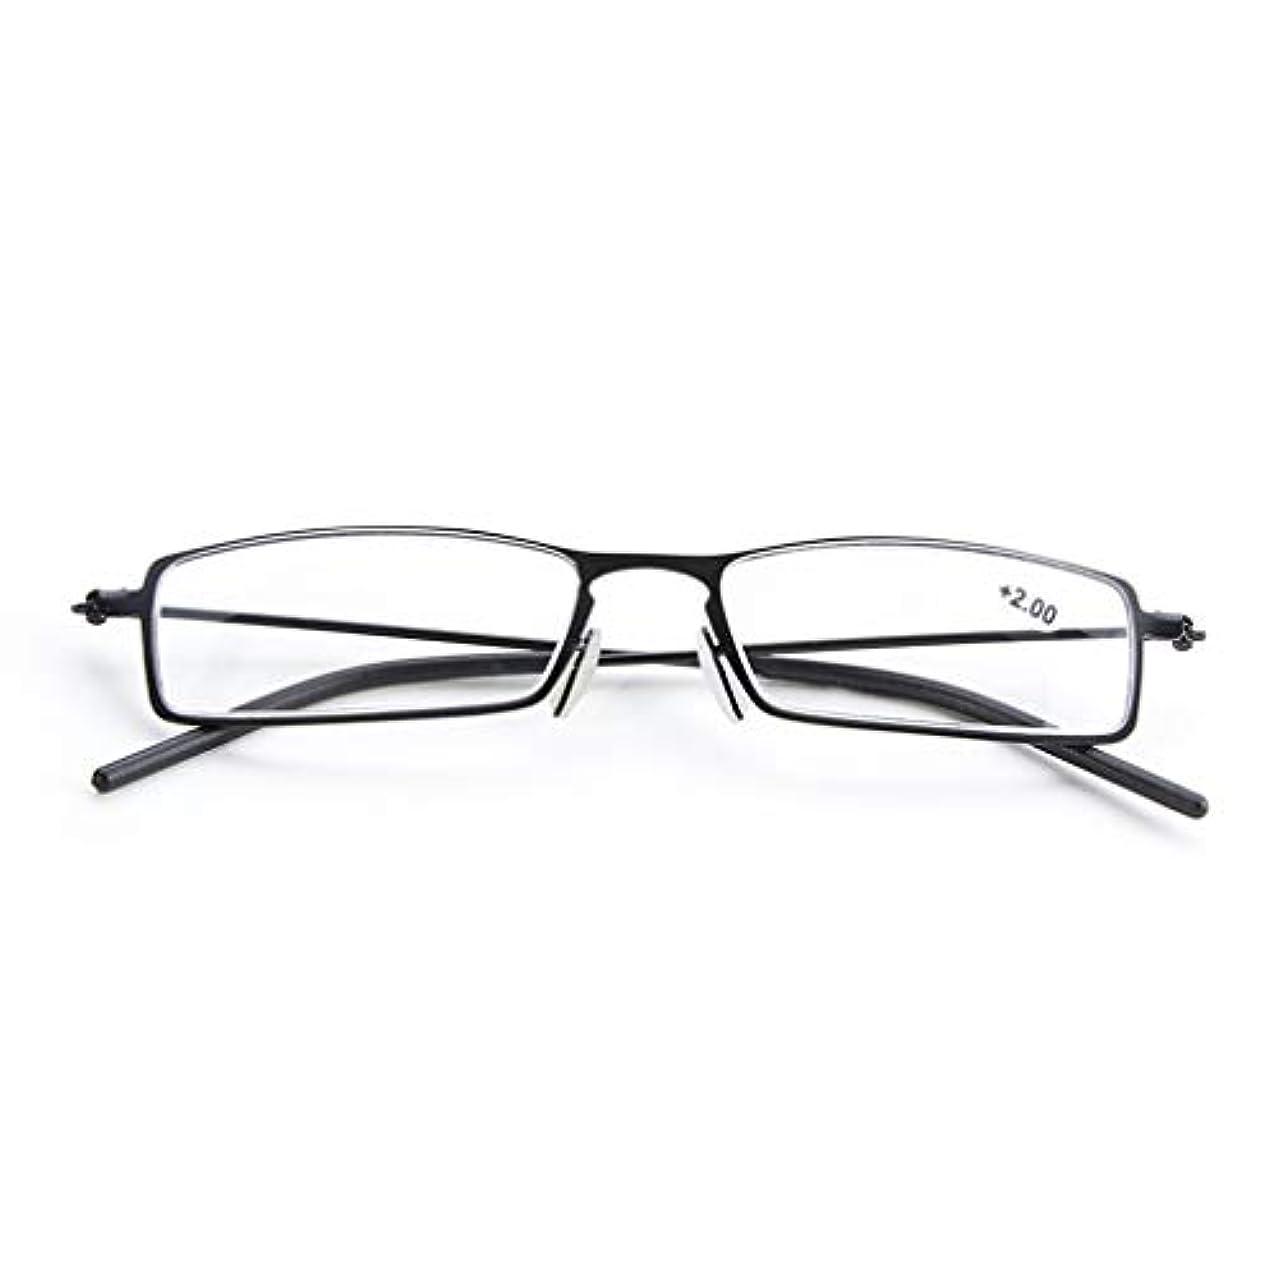 LCSHAN フルフレーム老眼鏡樹脂ユニセックス超スタイリッシュでエレガントなアンチブルー+2.0 (Color : Black, Size : 150 degrees)